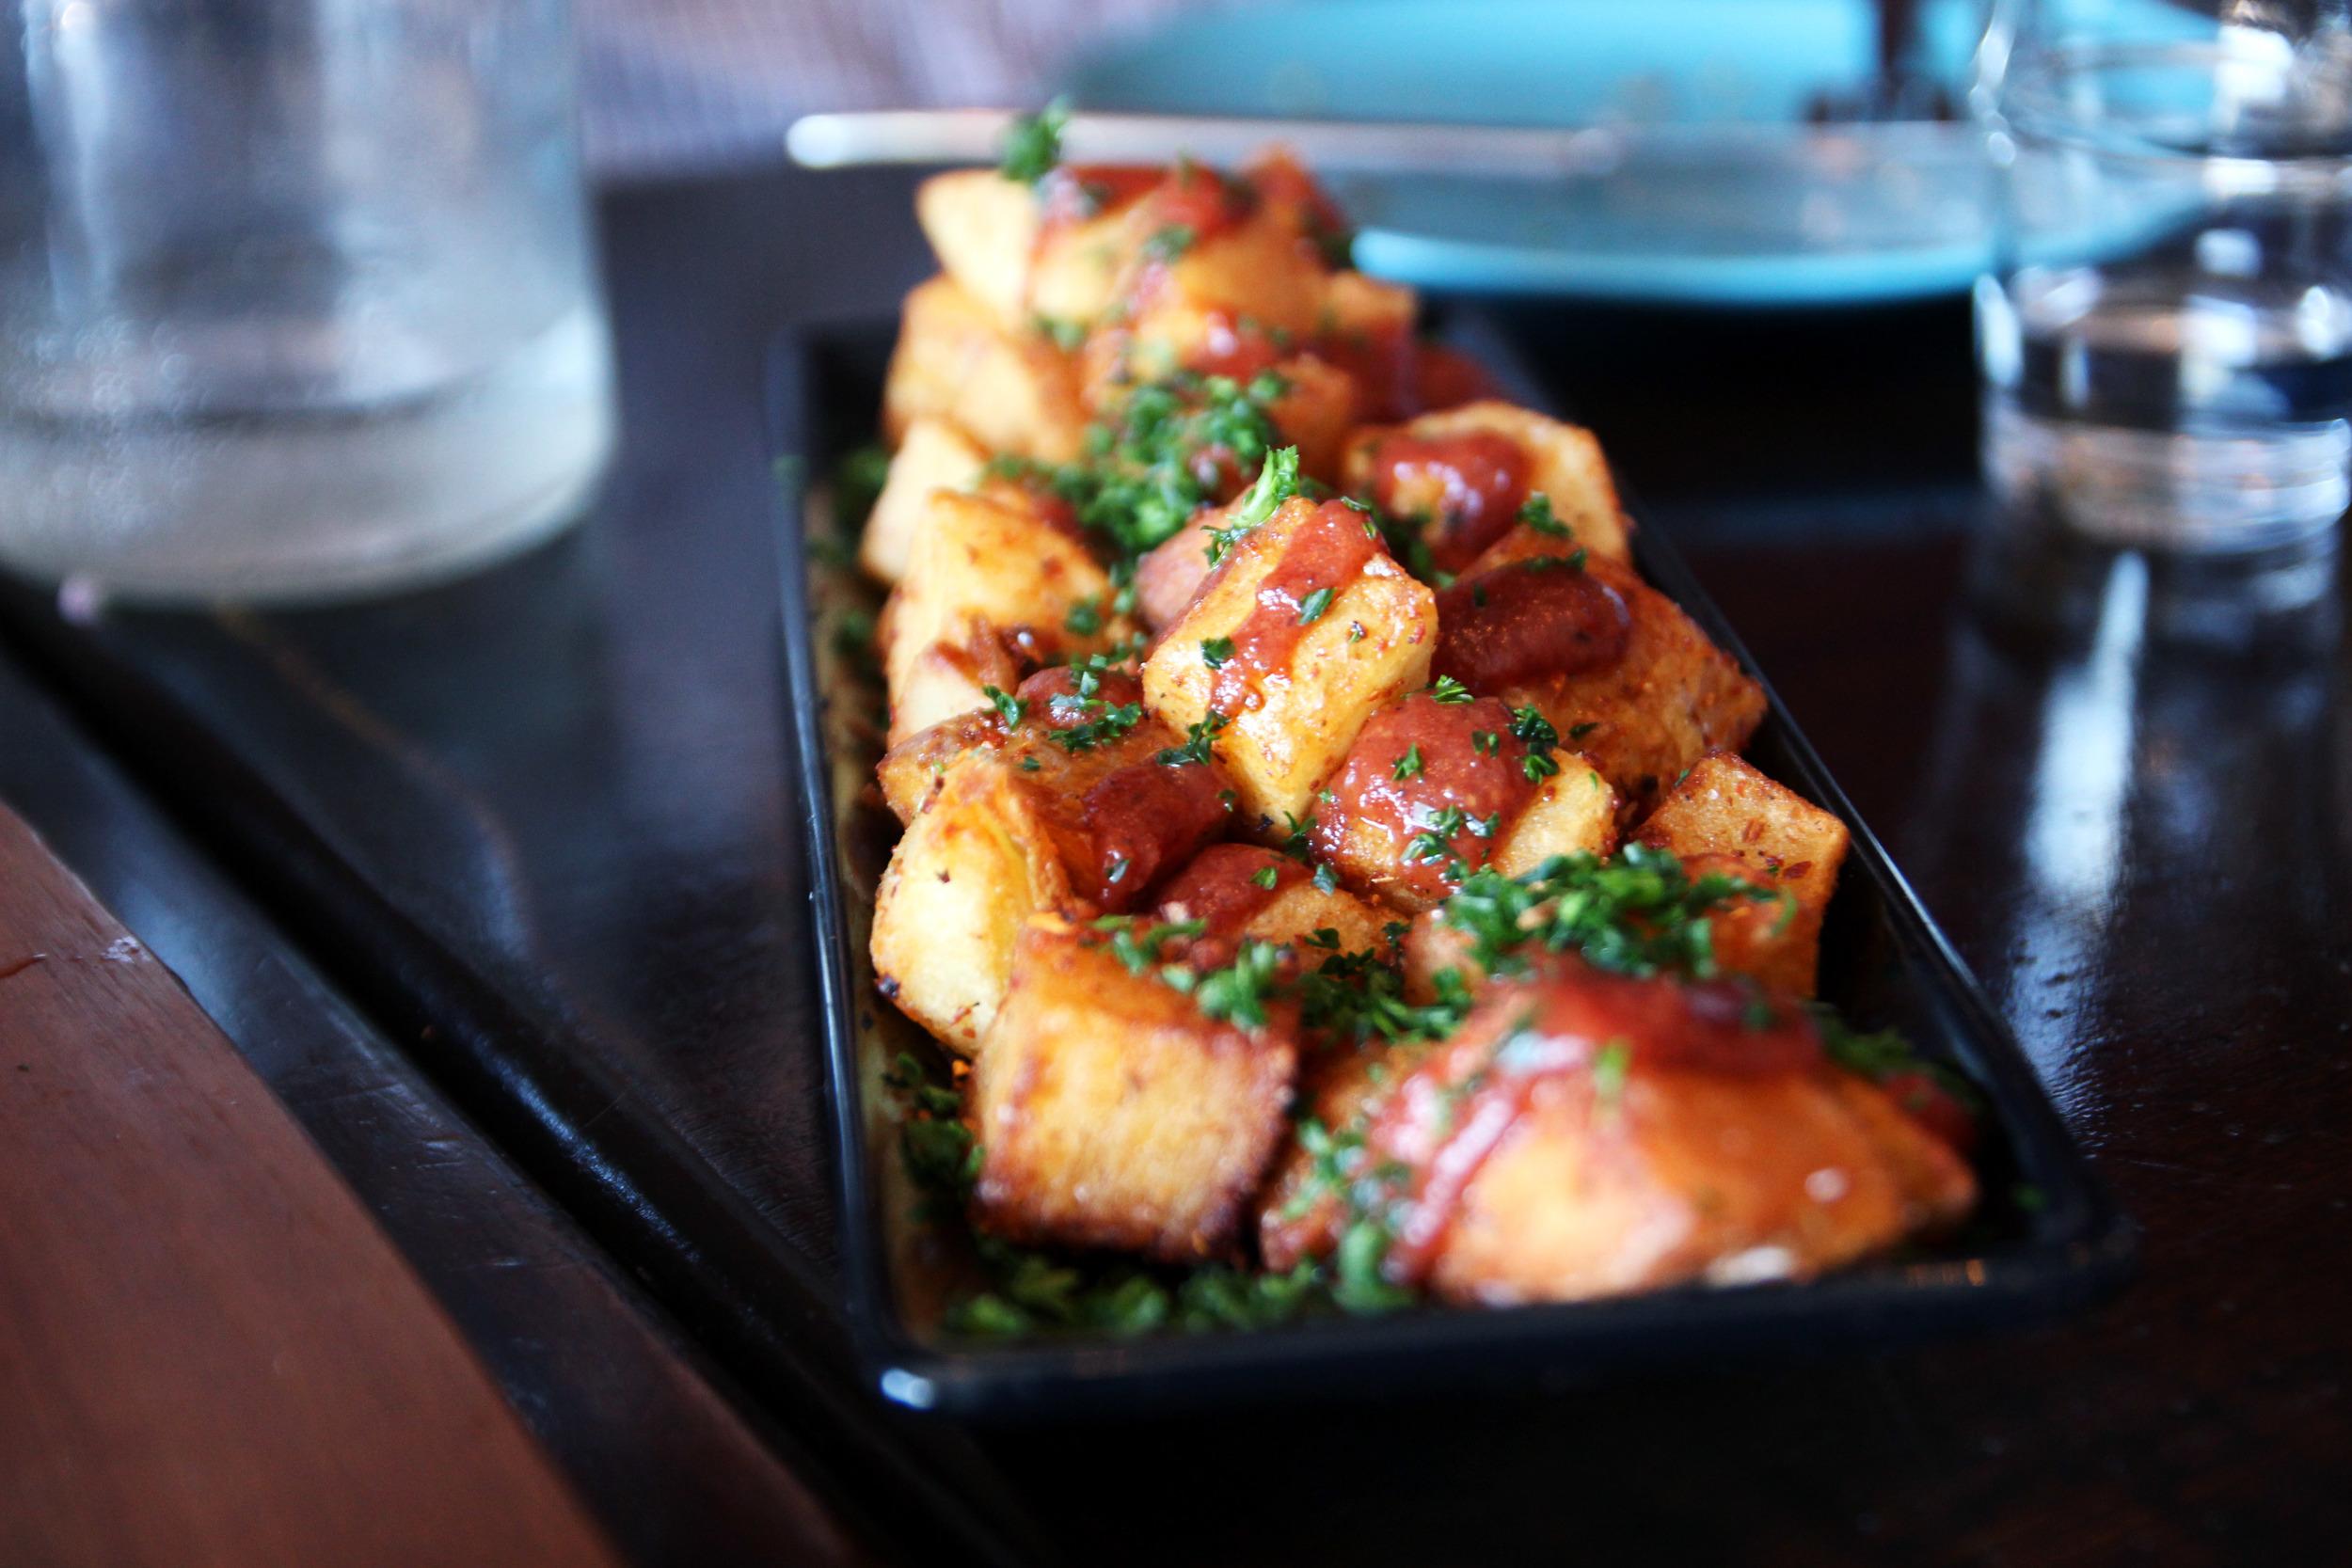 Batata harra cubed fried potatoes with house spice blend & tomato chutney